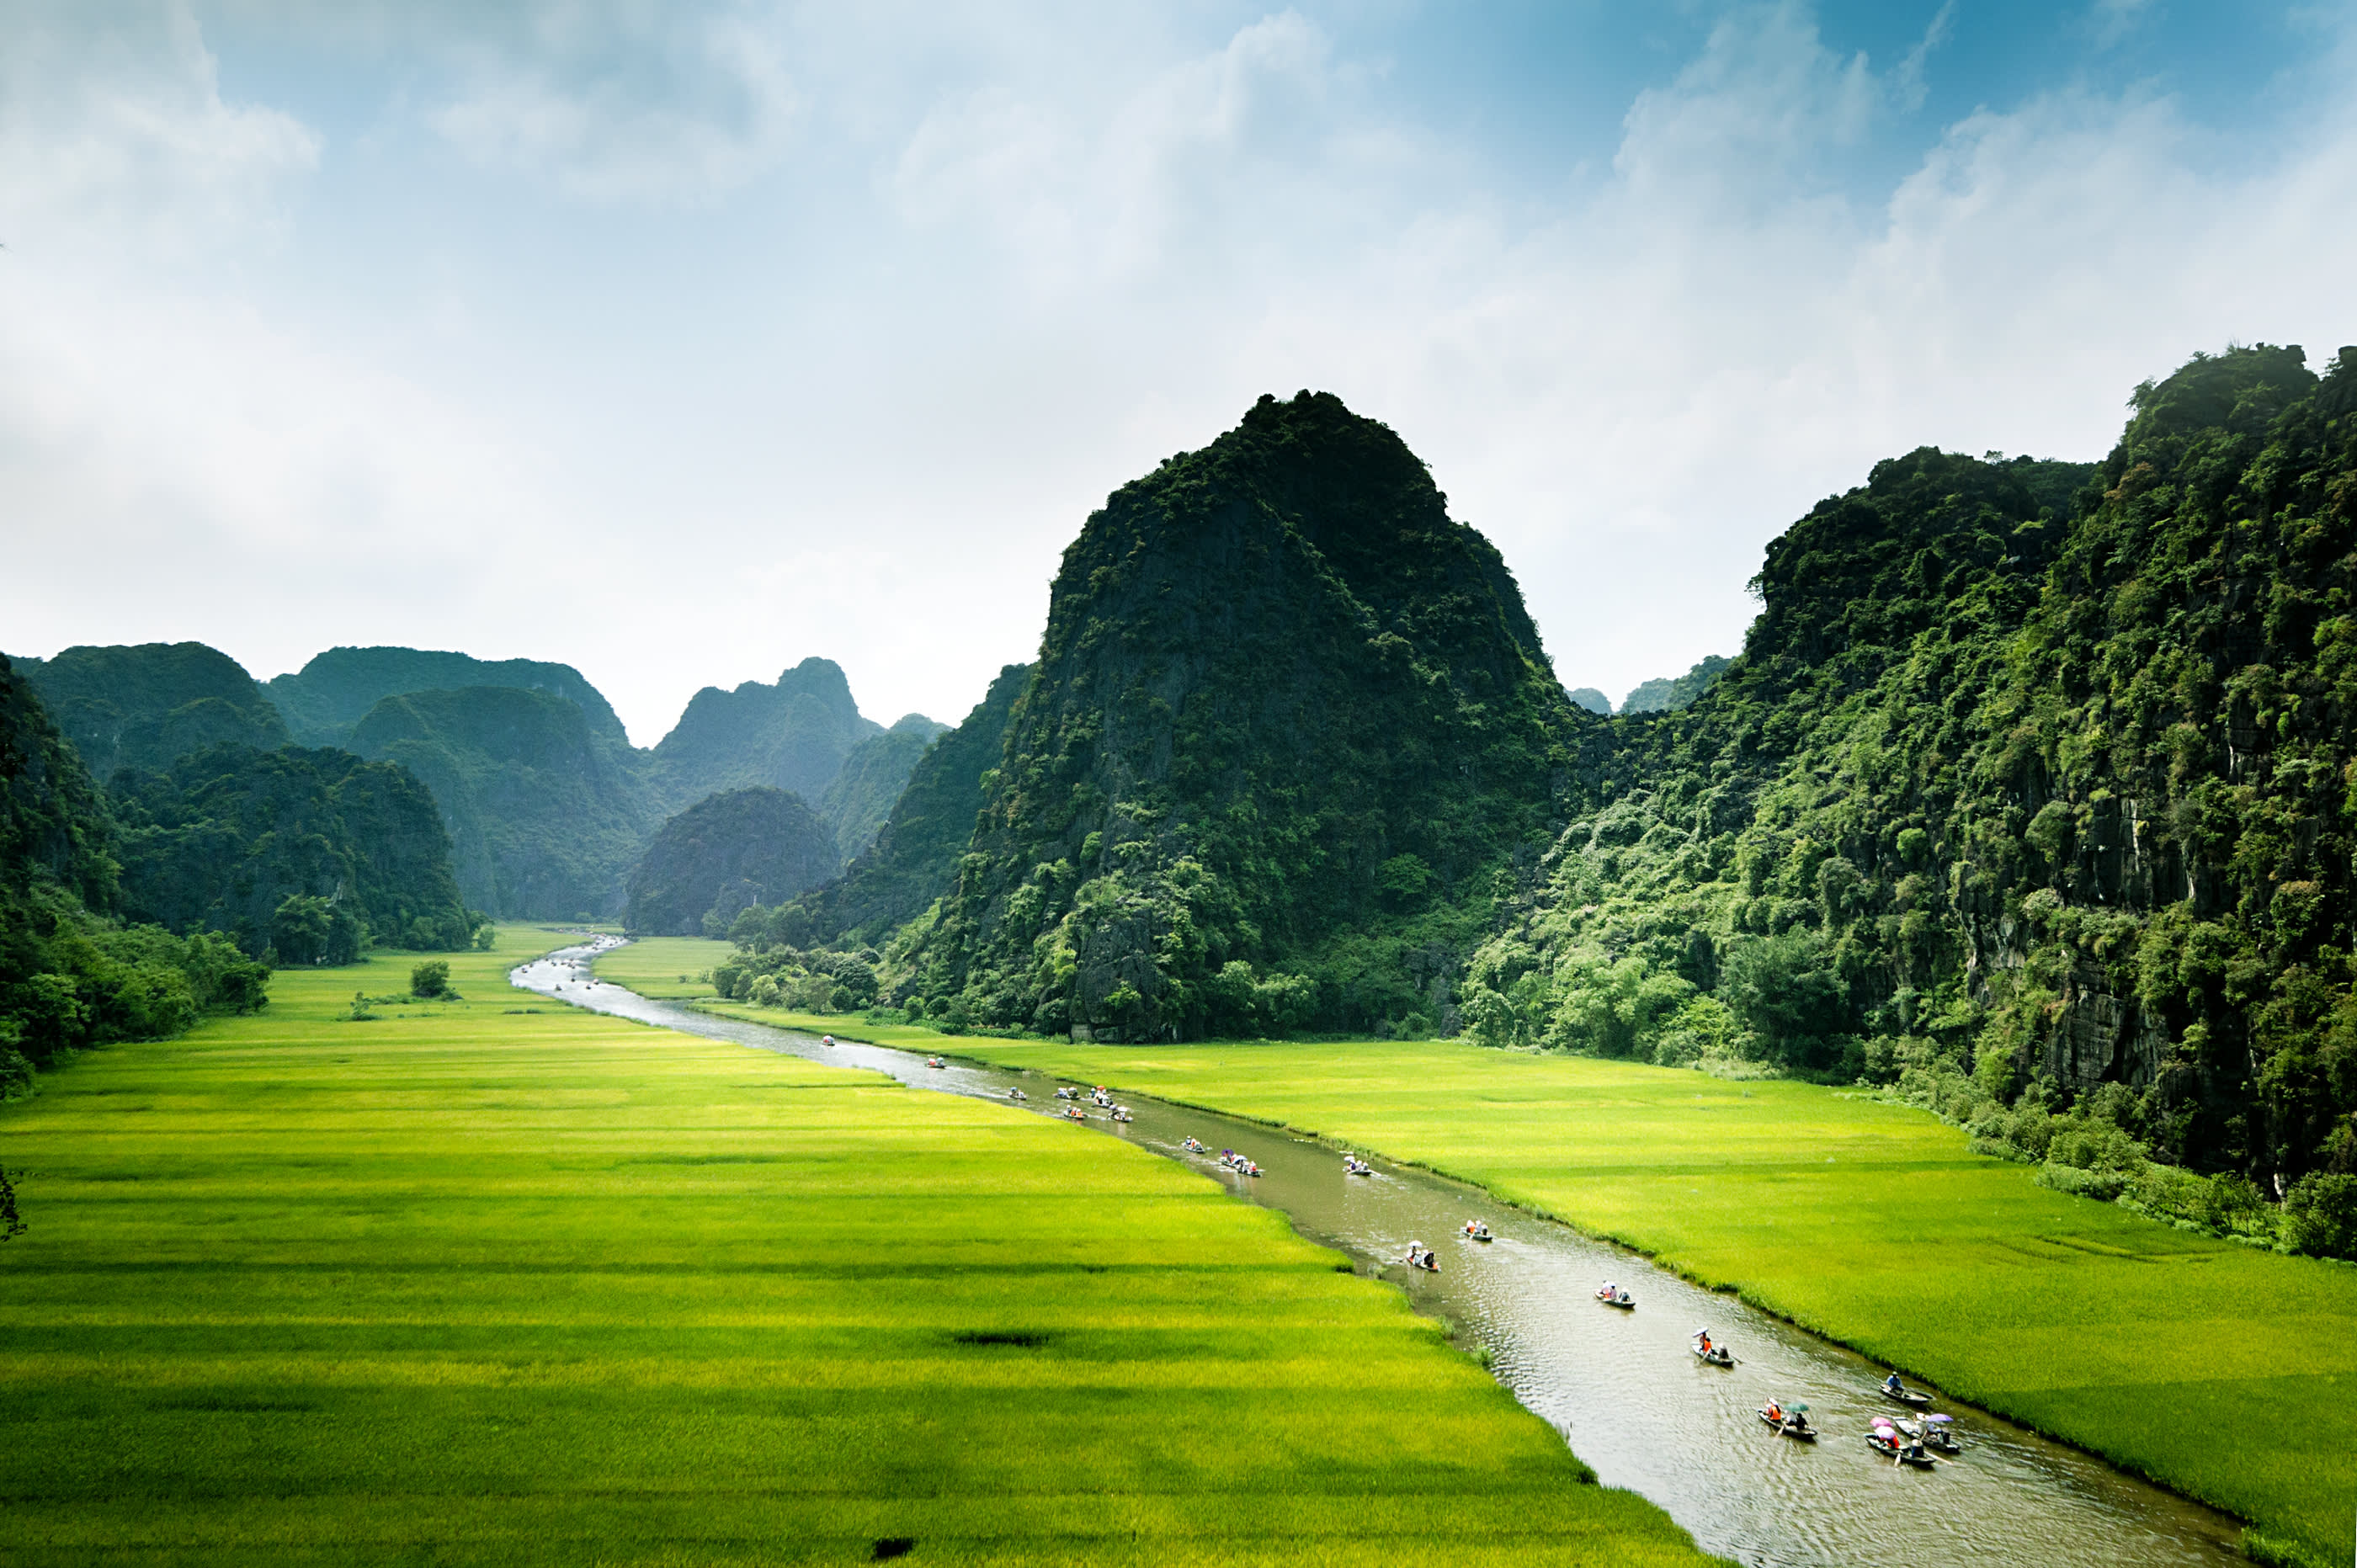 Rice field and river, Ninh Binh, vietnam landscapes